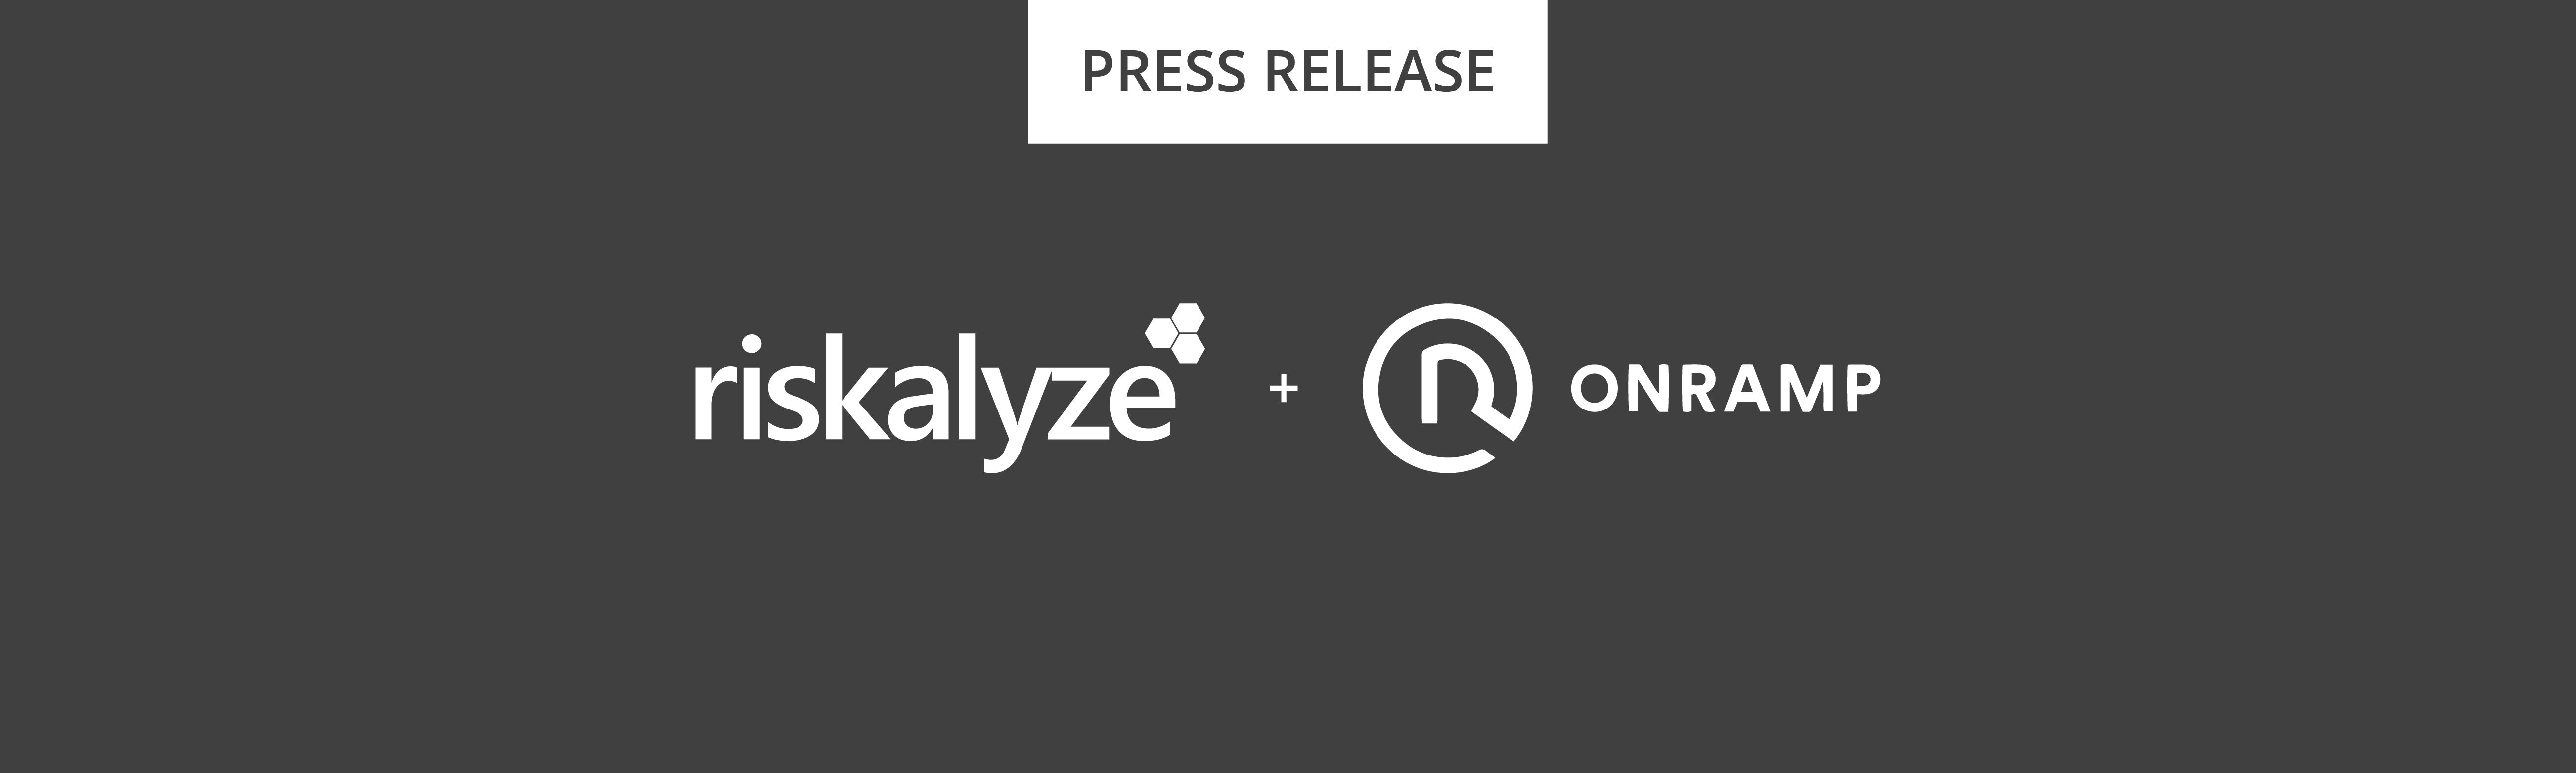 Riskalyze + Onramp Investing Press Release